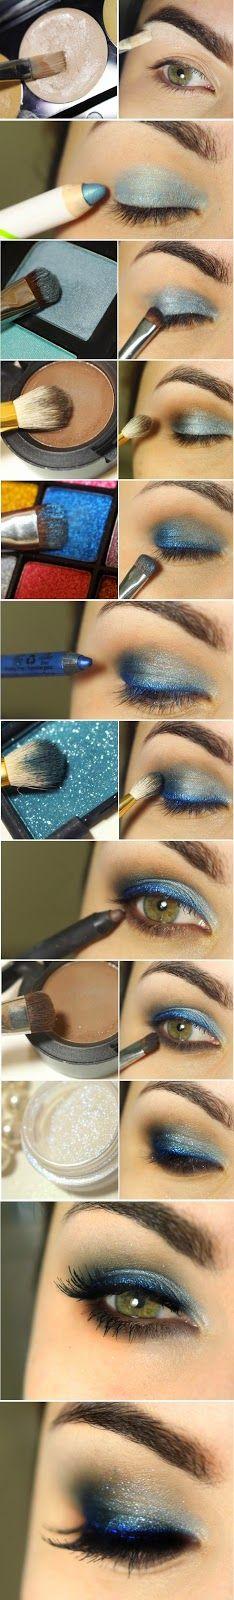 Gorgeous Pop Blue and Smokey Brown Shade Makeup Tutorials / Best LoLus Makeup Fashion